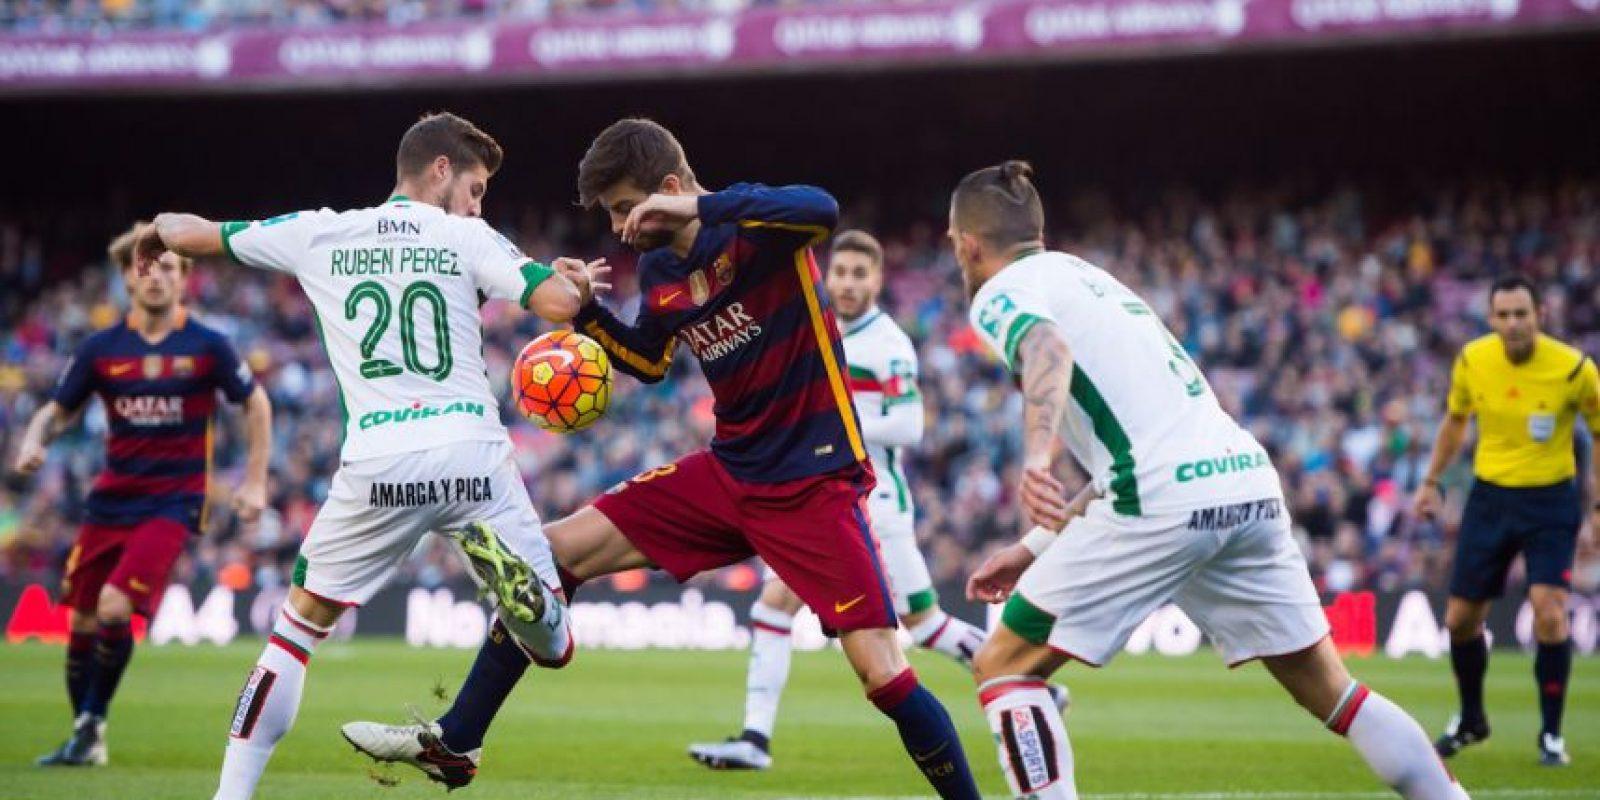 LIGA BBVA: 23 de abril / Barcelona vs. Sporting Gijón Foto:Getty Images